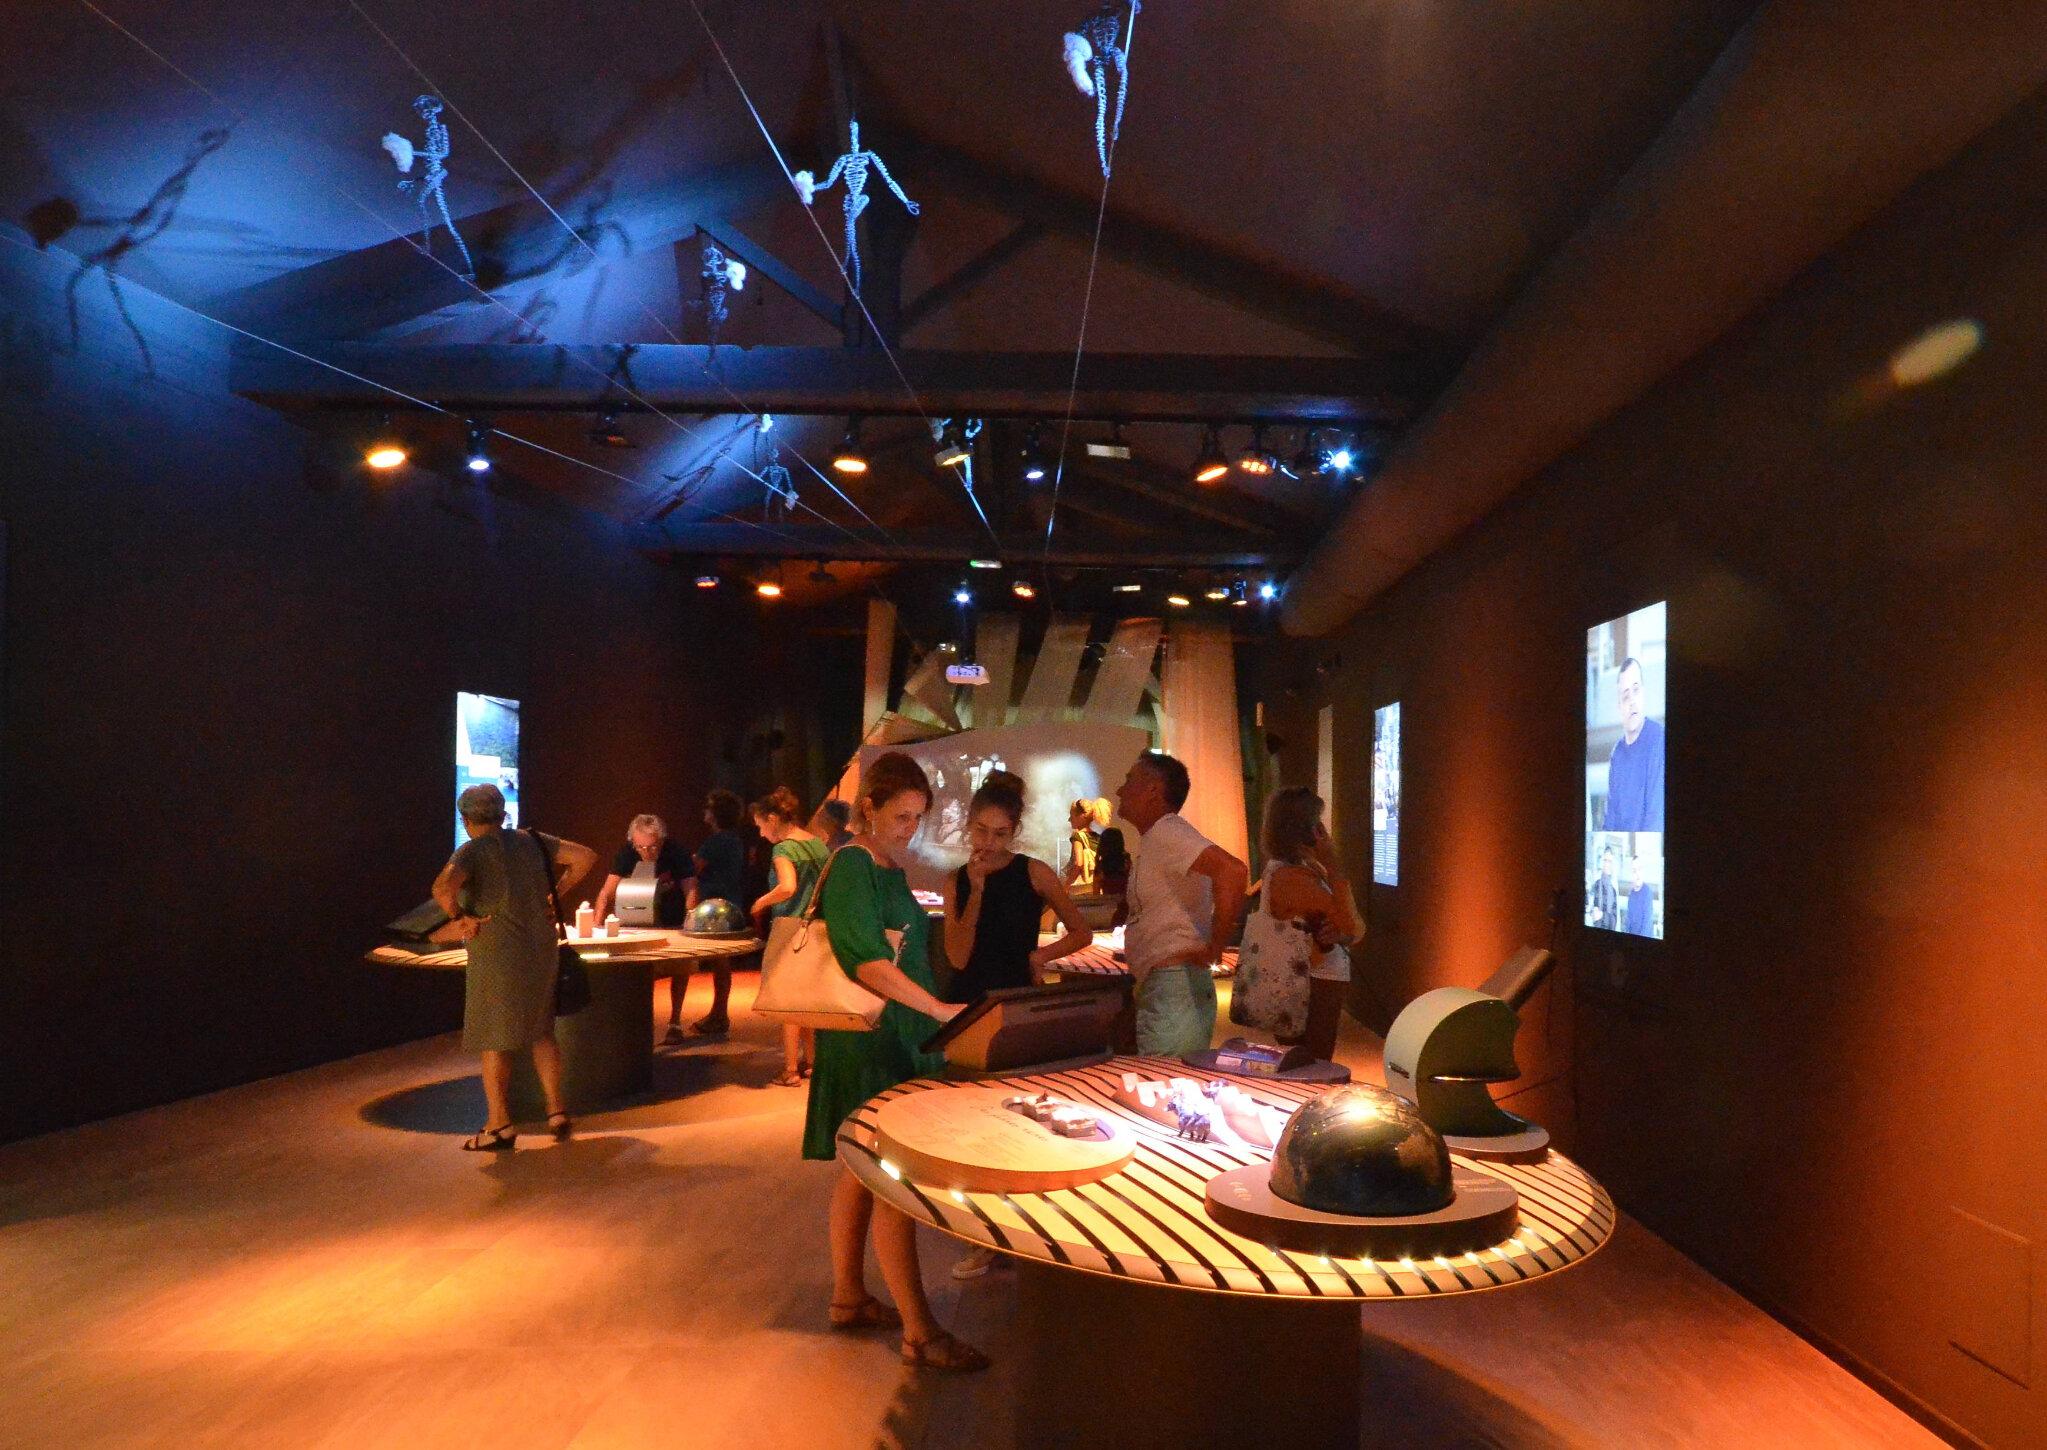 Filaventure : voyage au centre de la fibre